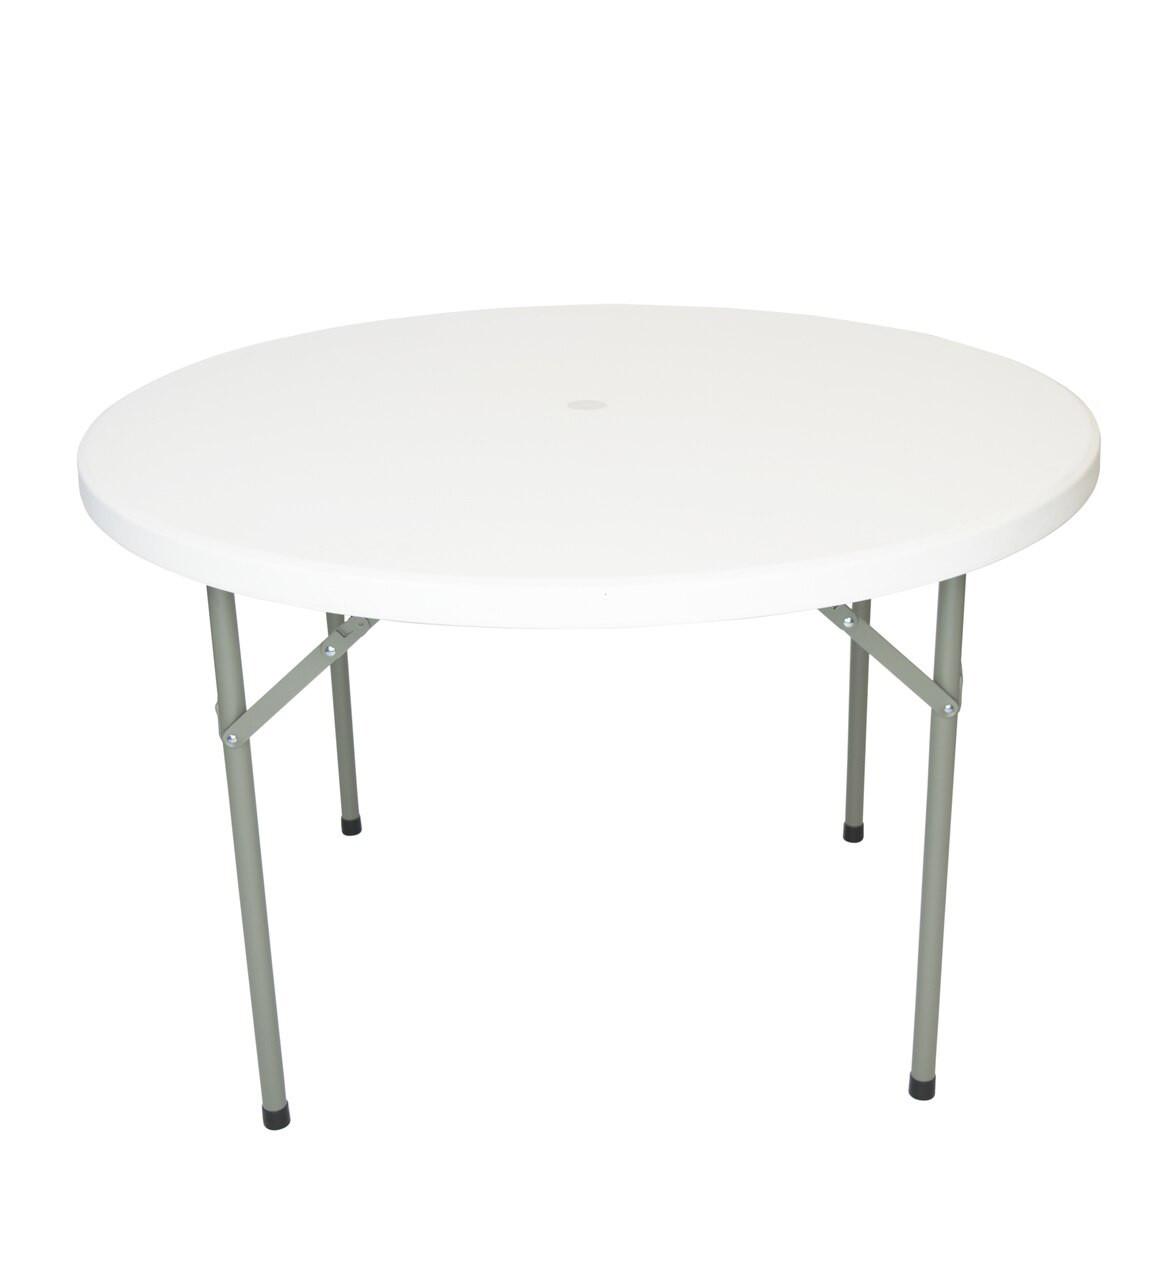 Rhinolite 48 4 Ft Round Plastic Folding Table With Umbrella Hole Solid One Piece Top Locking Steel Frame Foldingchairsandtables Com